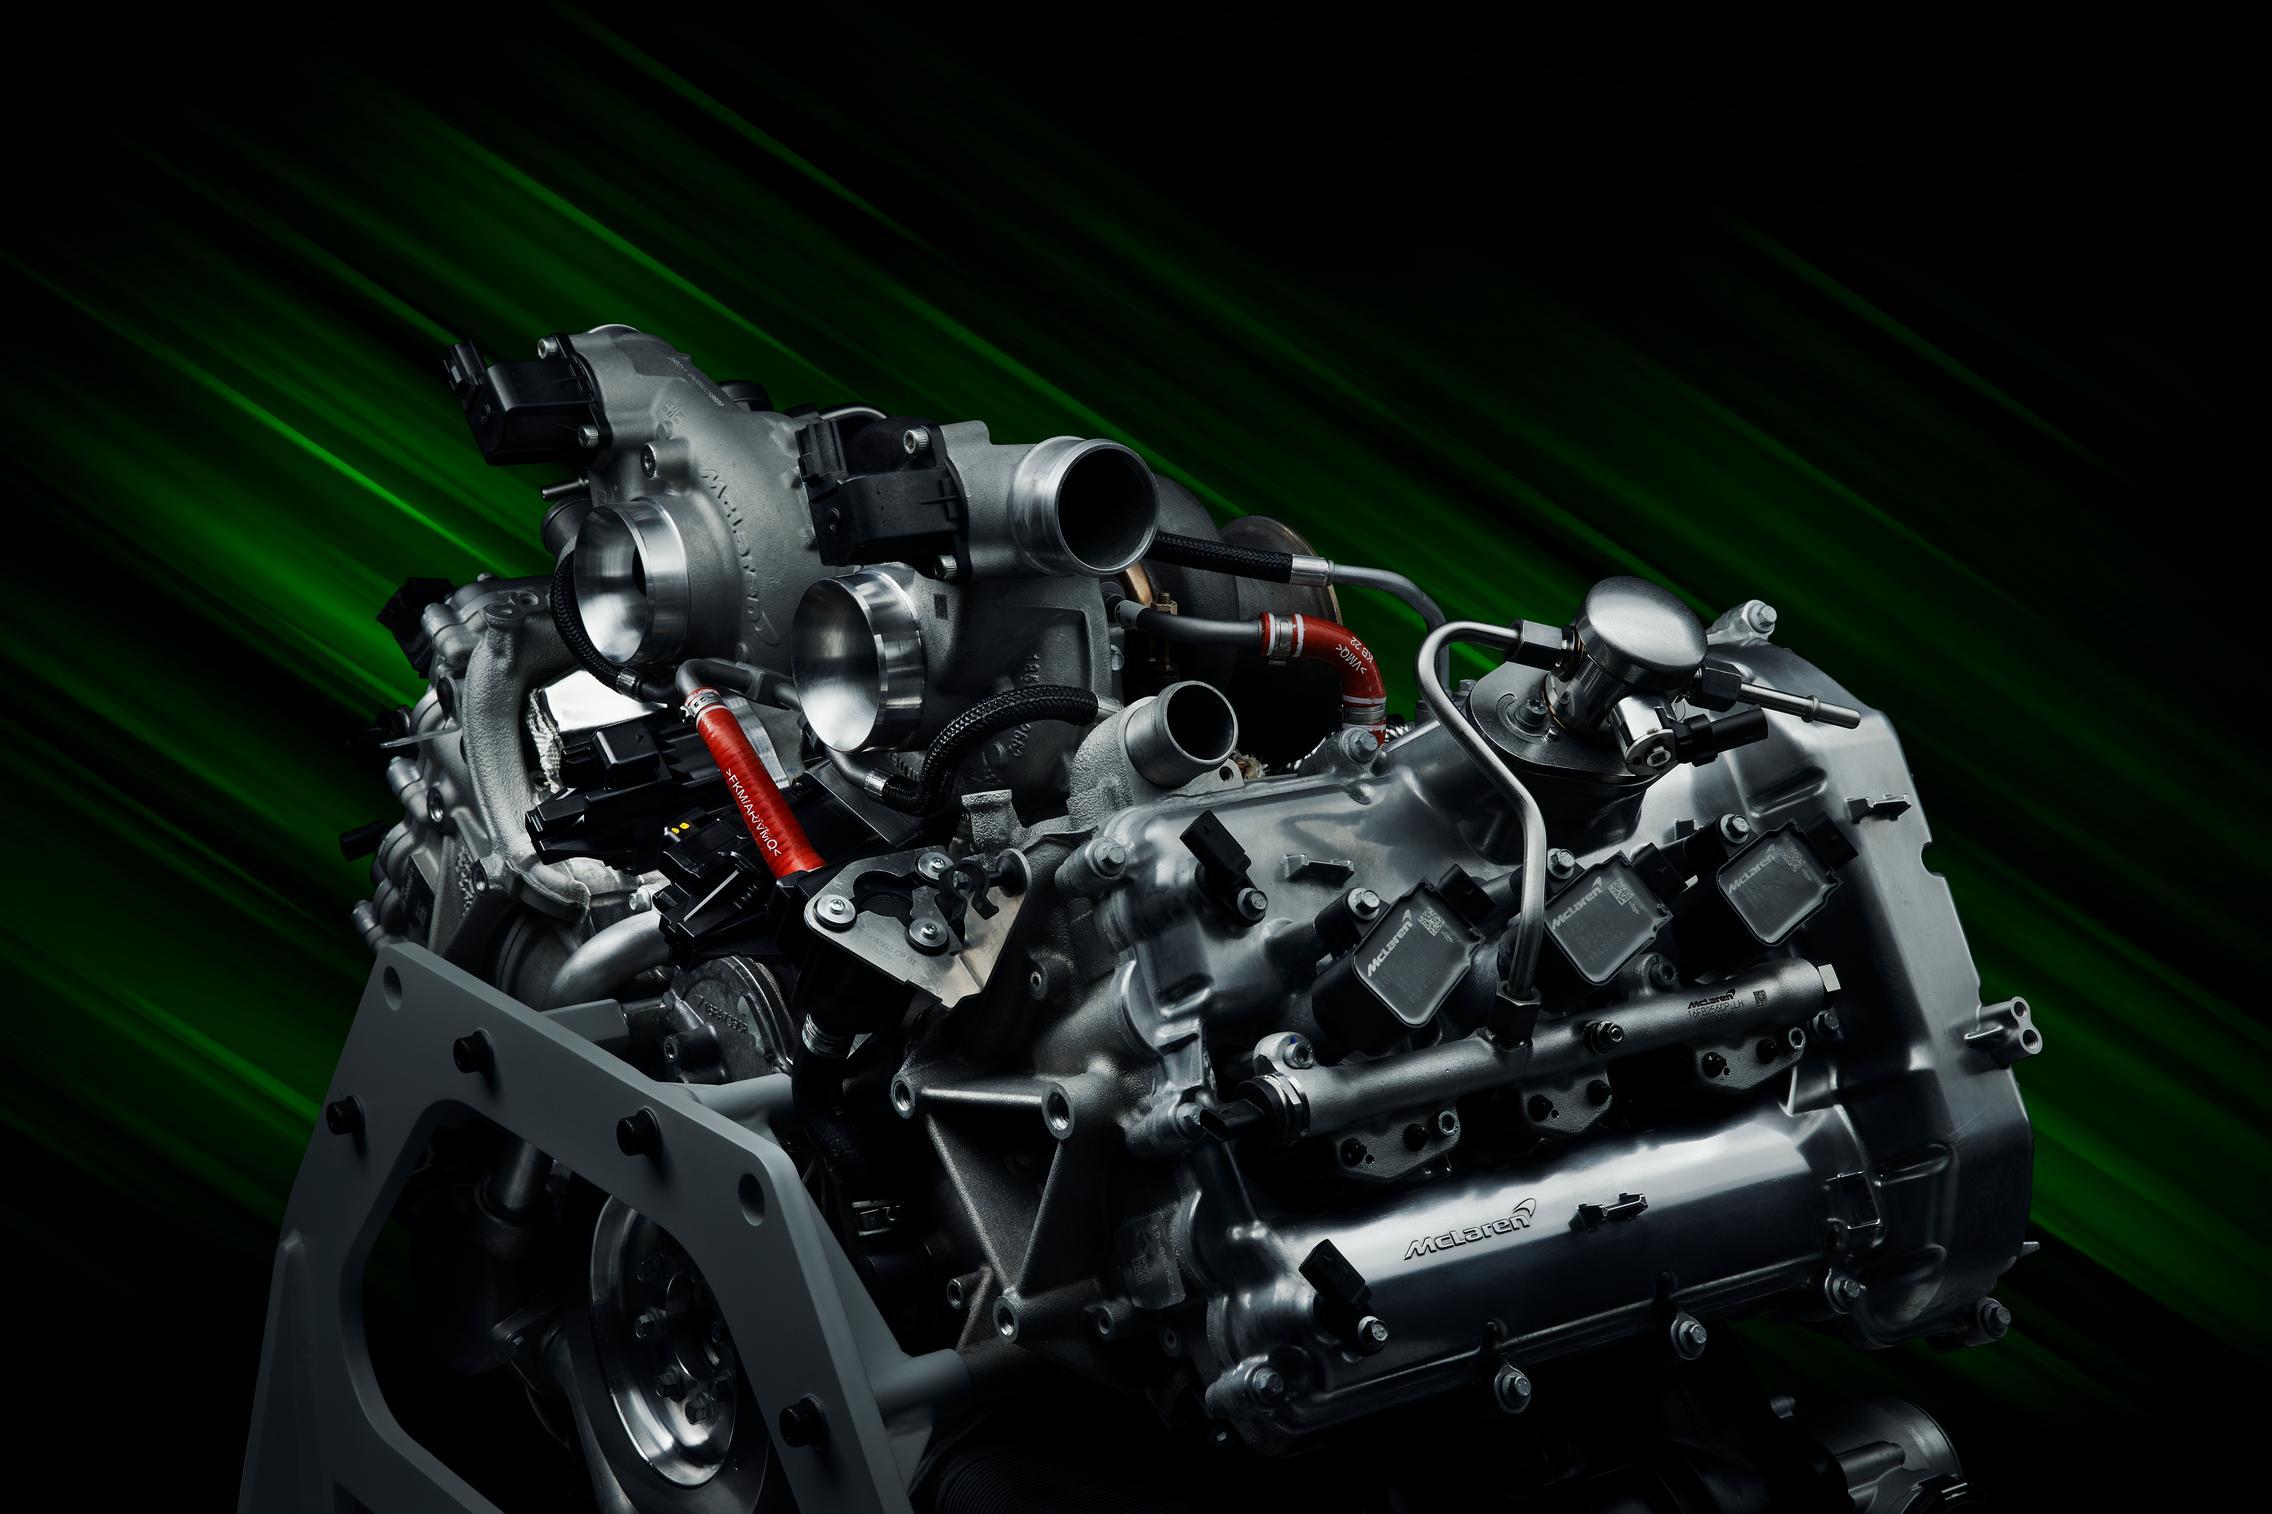 McLaren Artura engine